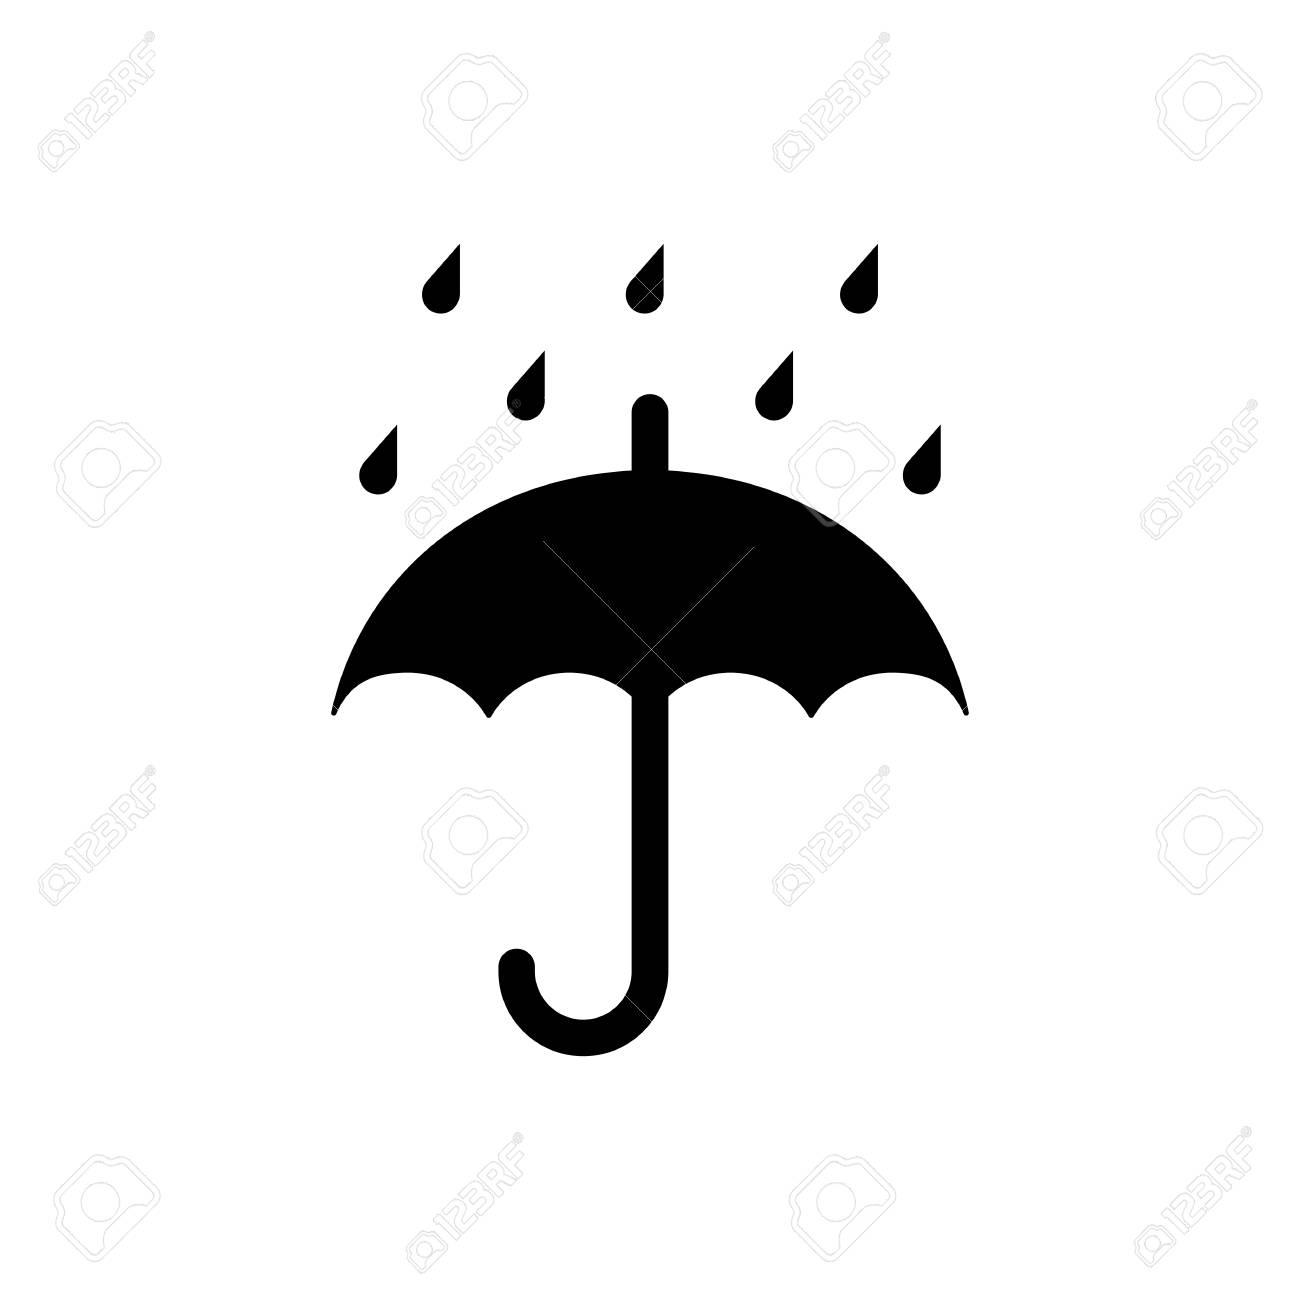 Keep dry packaging symbol, umbrella and raindrops. Vector illustration - 99466976